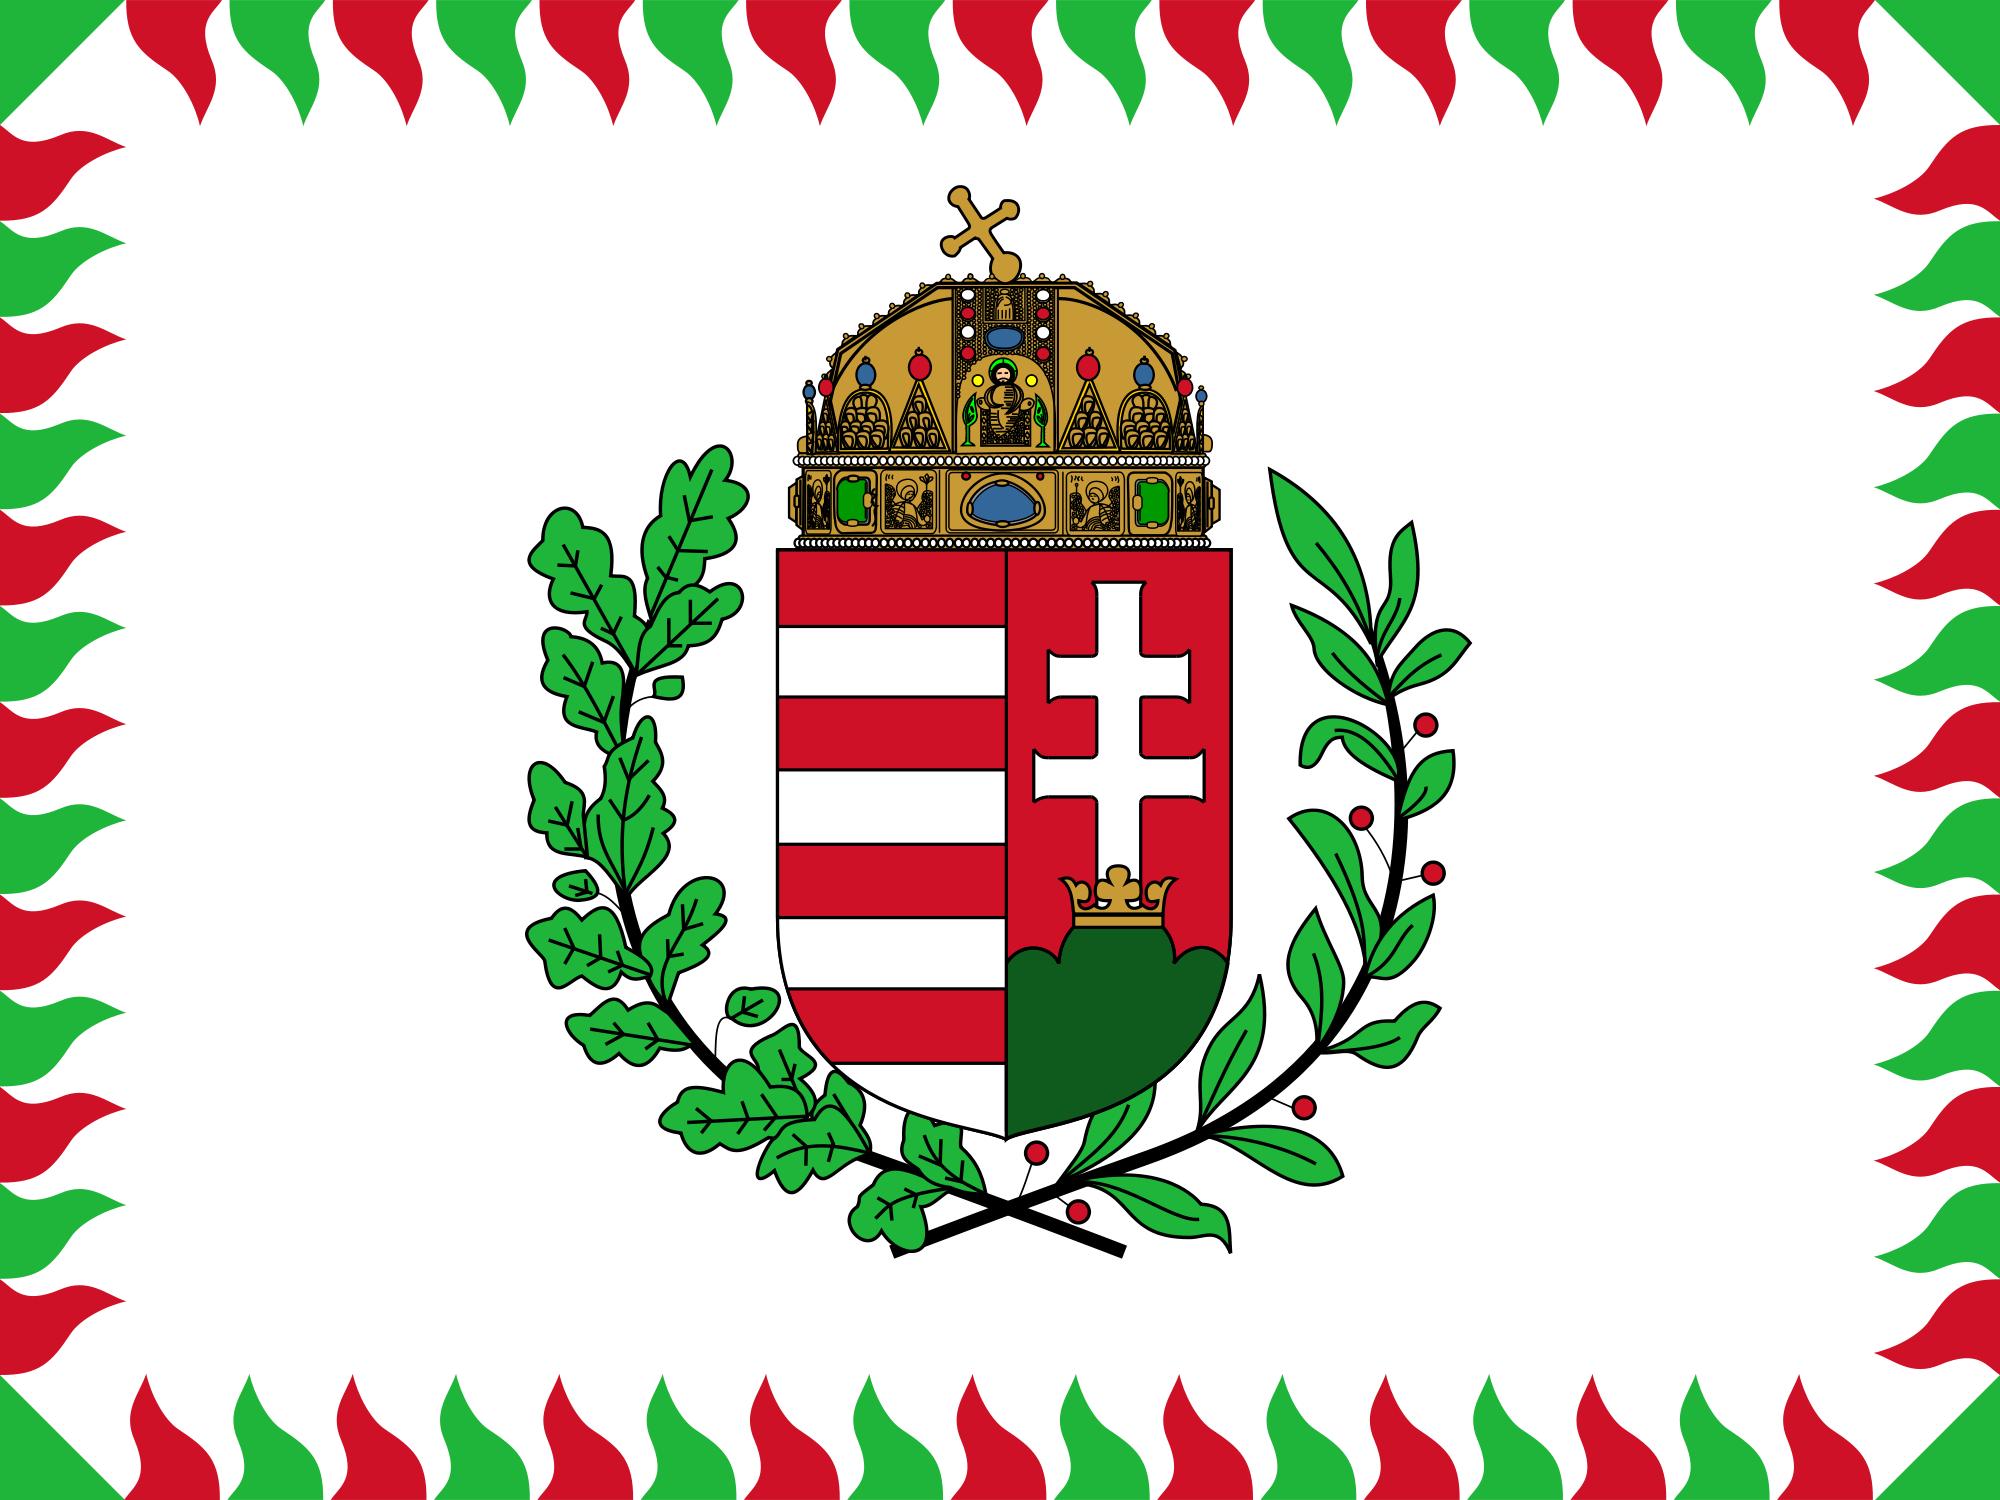 Hungary (Waf flag)